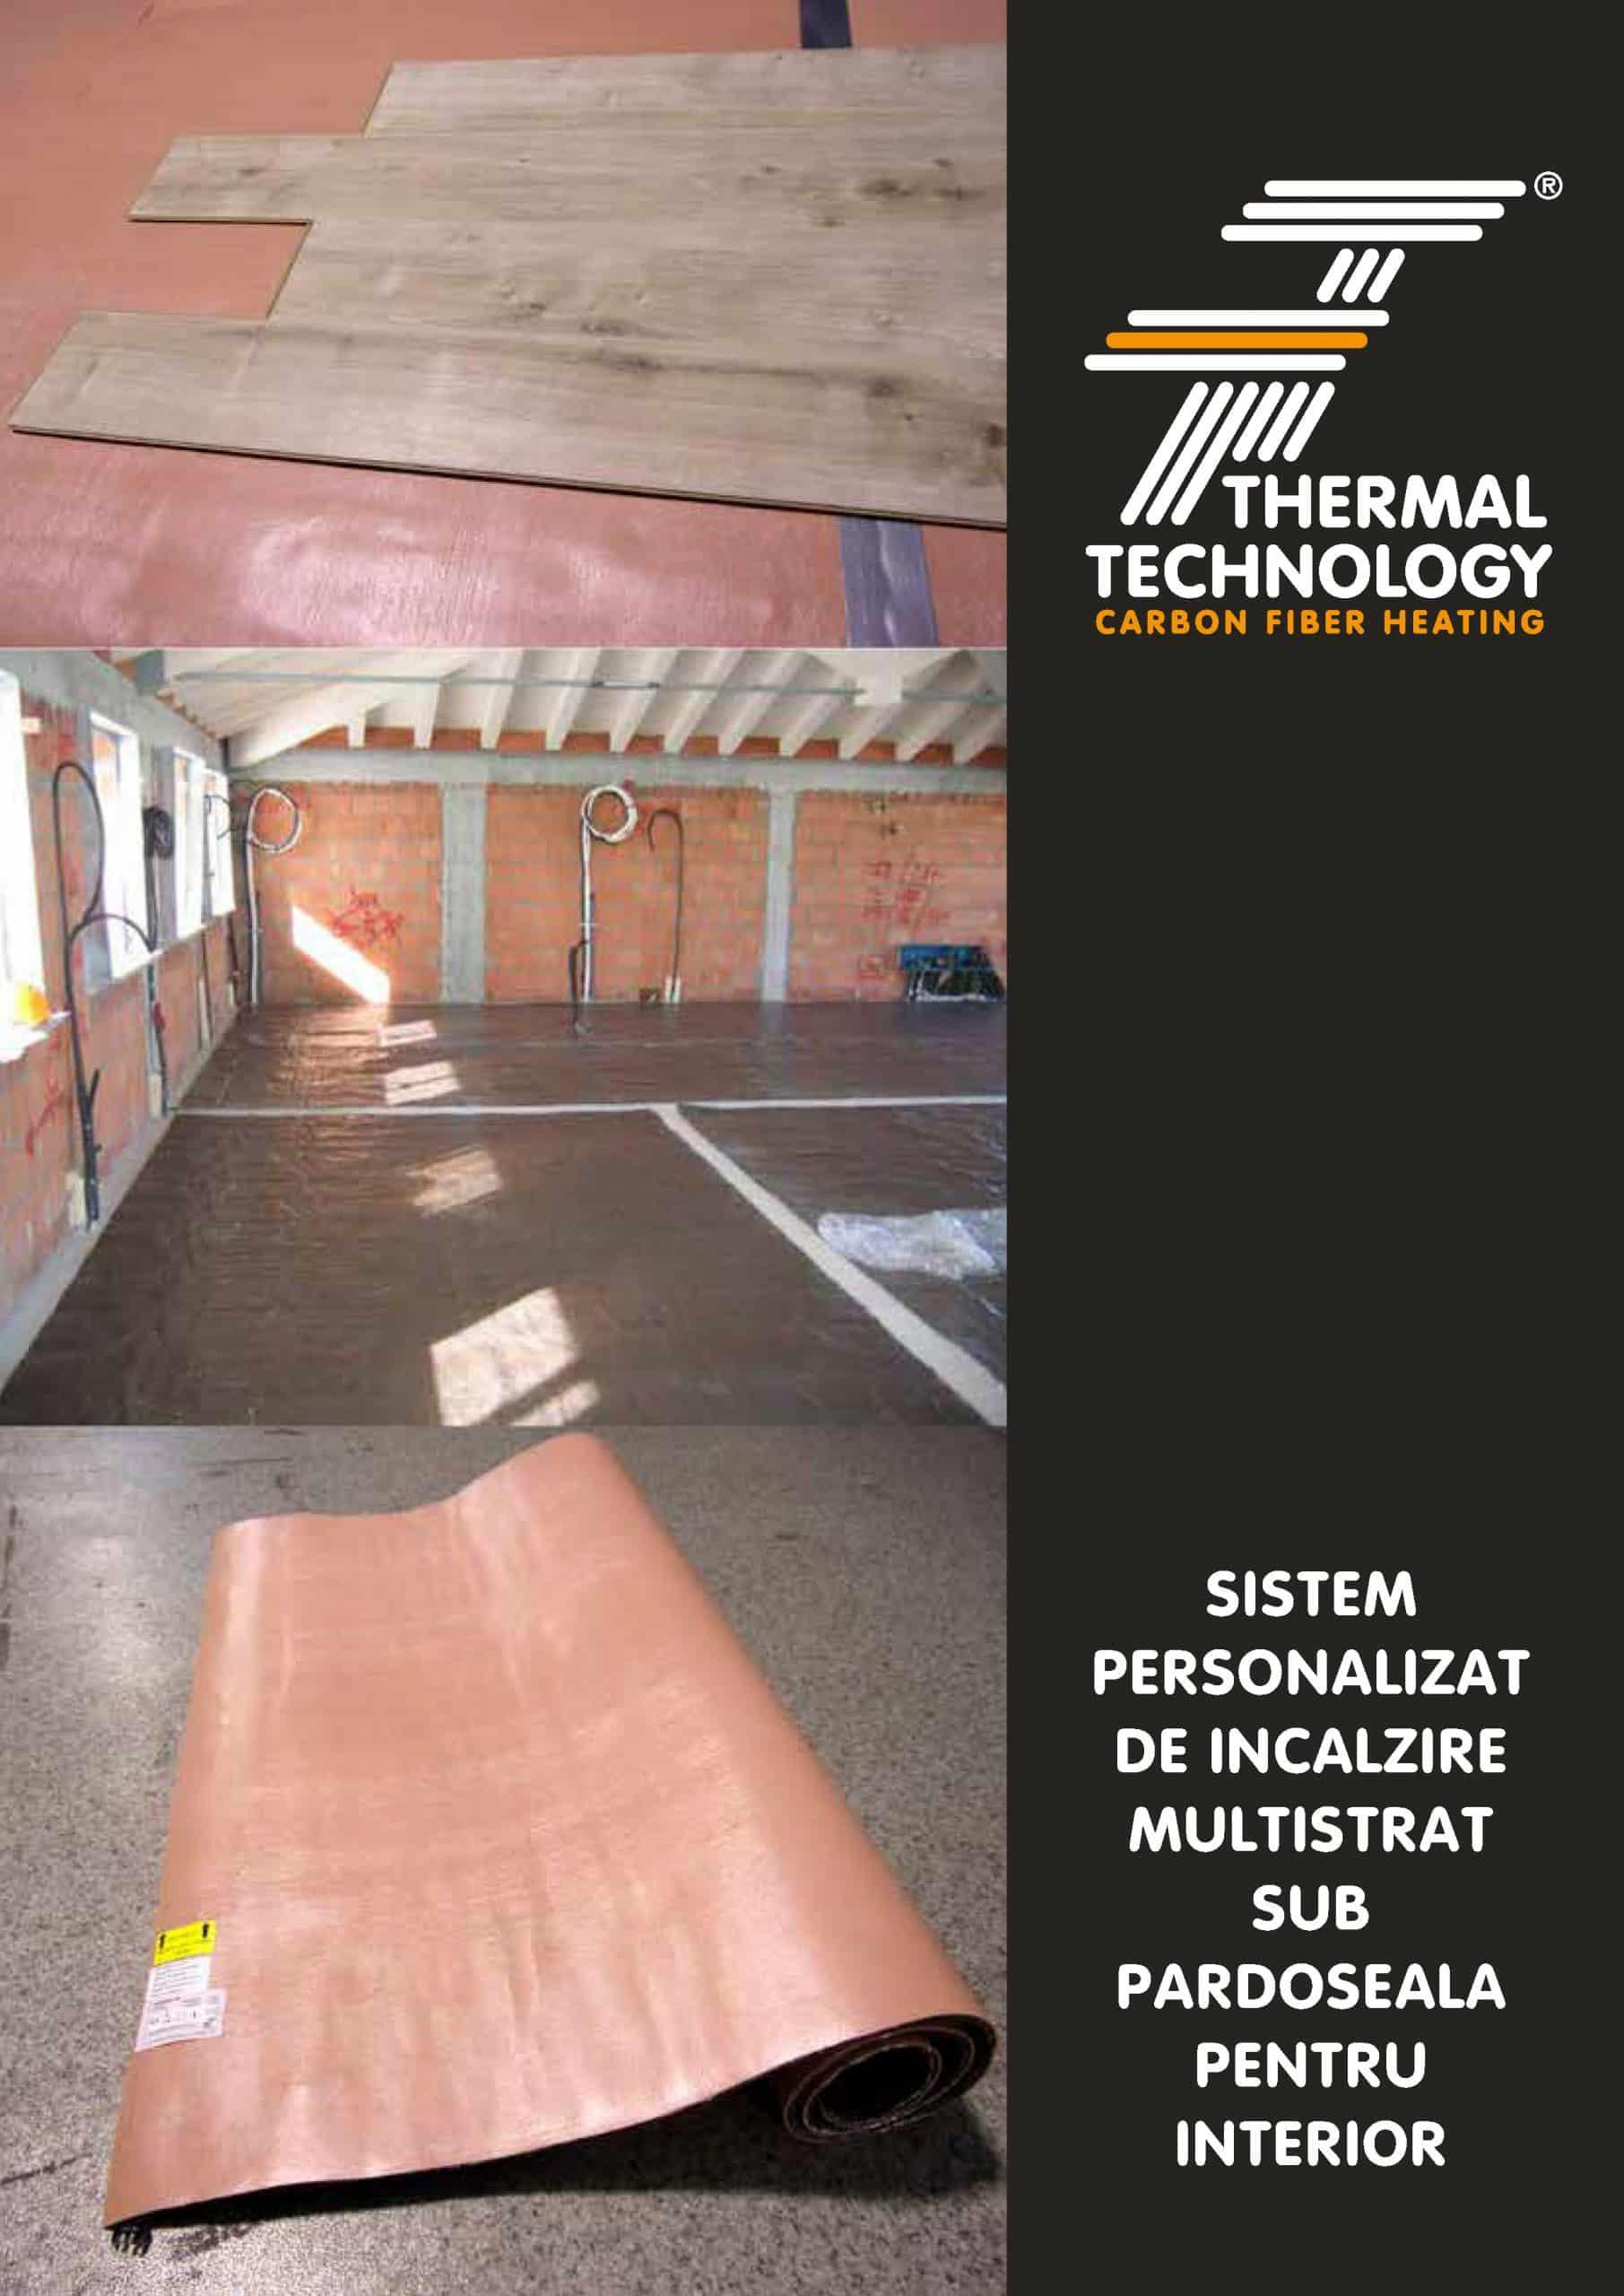 https://thermaltechnology.ro/wp-content/uploads/2020/07/PVSI_RO_Sistem-Personalizat-de-incalzire-Multistrat-sub-pardoseala-pentru-Int_Page_1-1-scaled.jpg